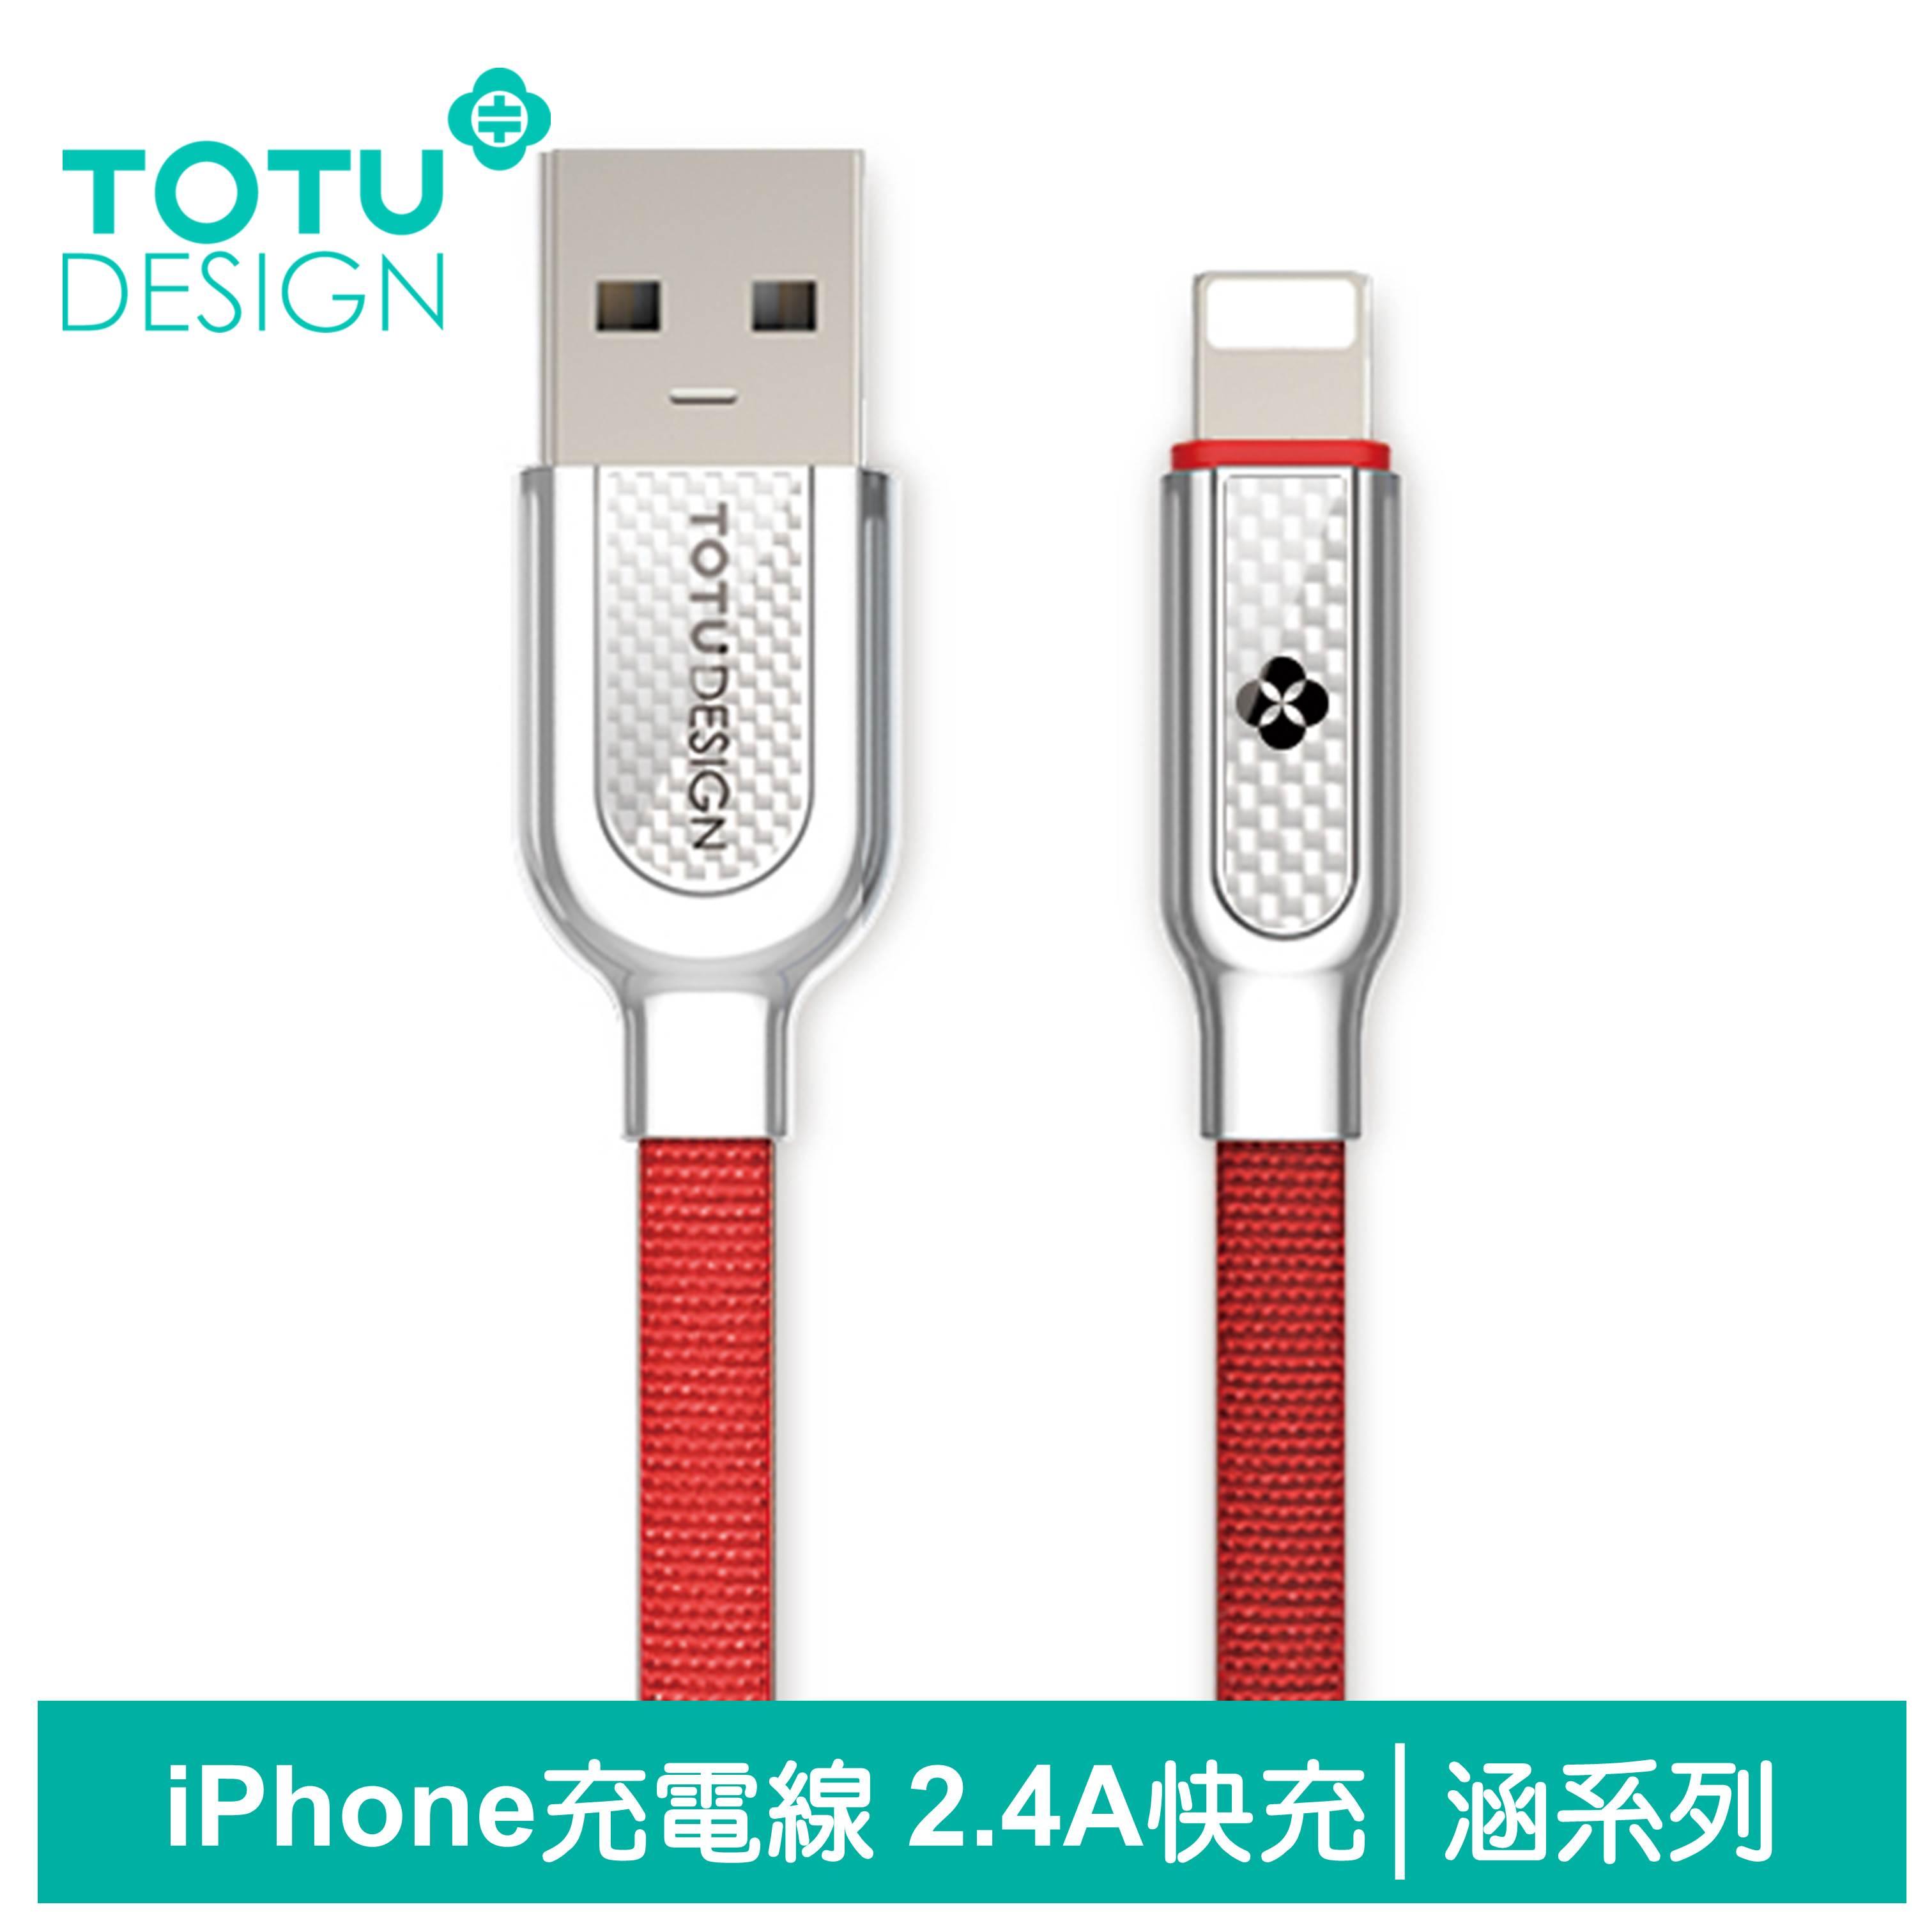 TOTU台灣官方 iPhone/Lightning充電線傳輸線 鋅合金 2.4A快充 涵系列 120cm 紅色